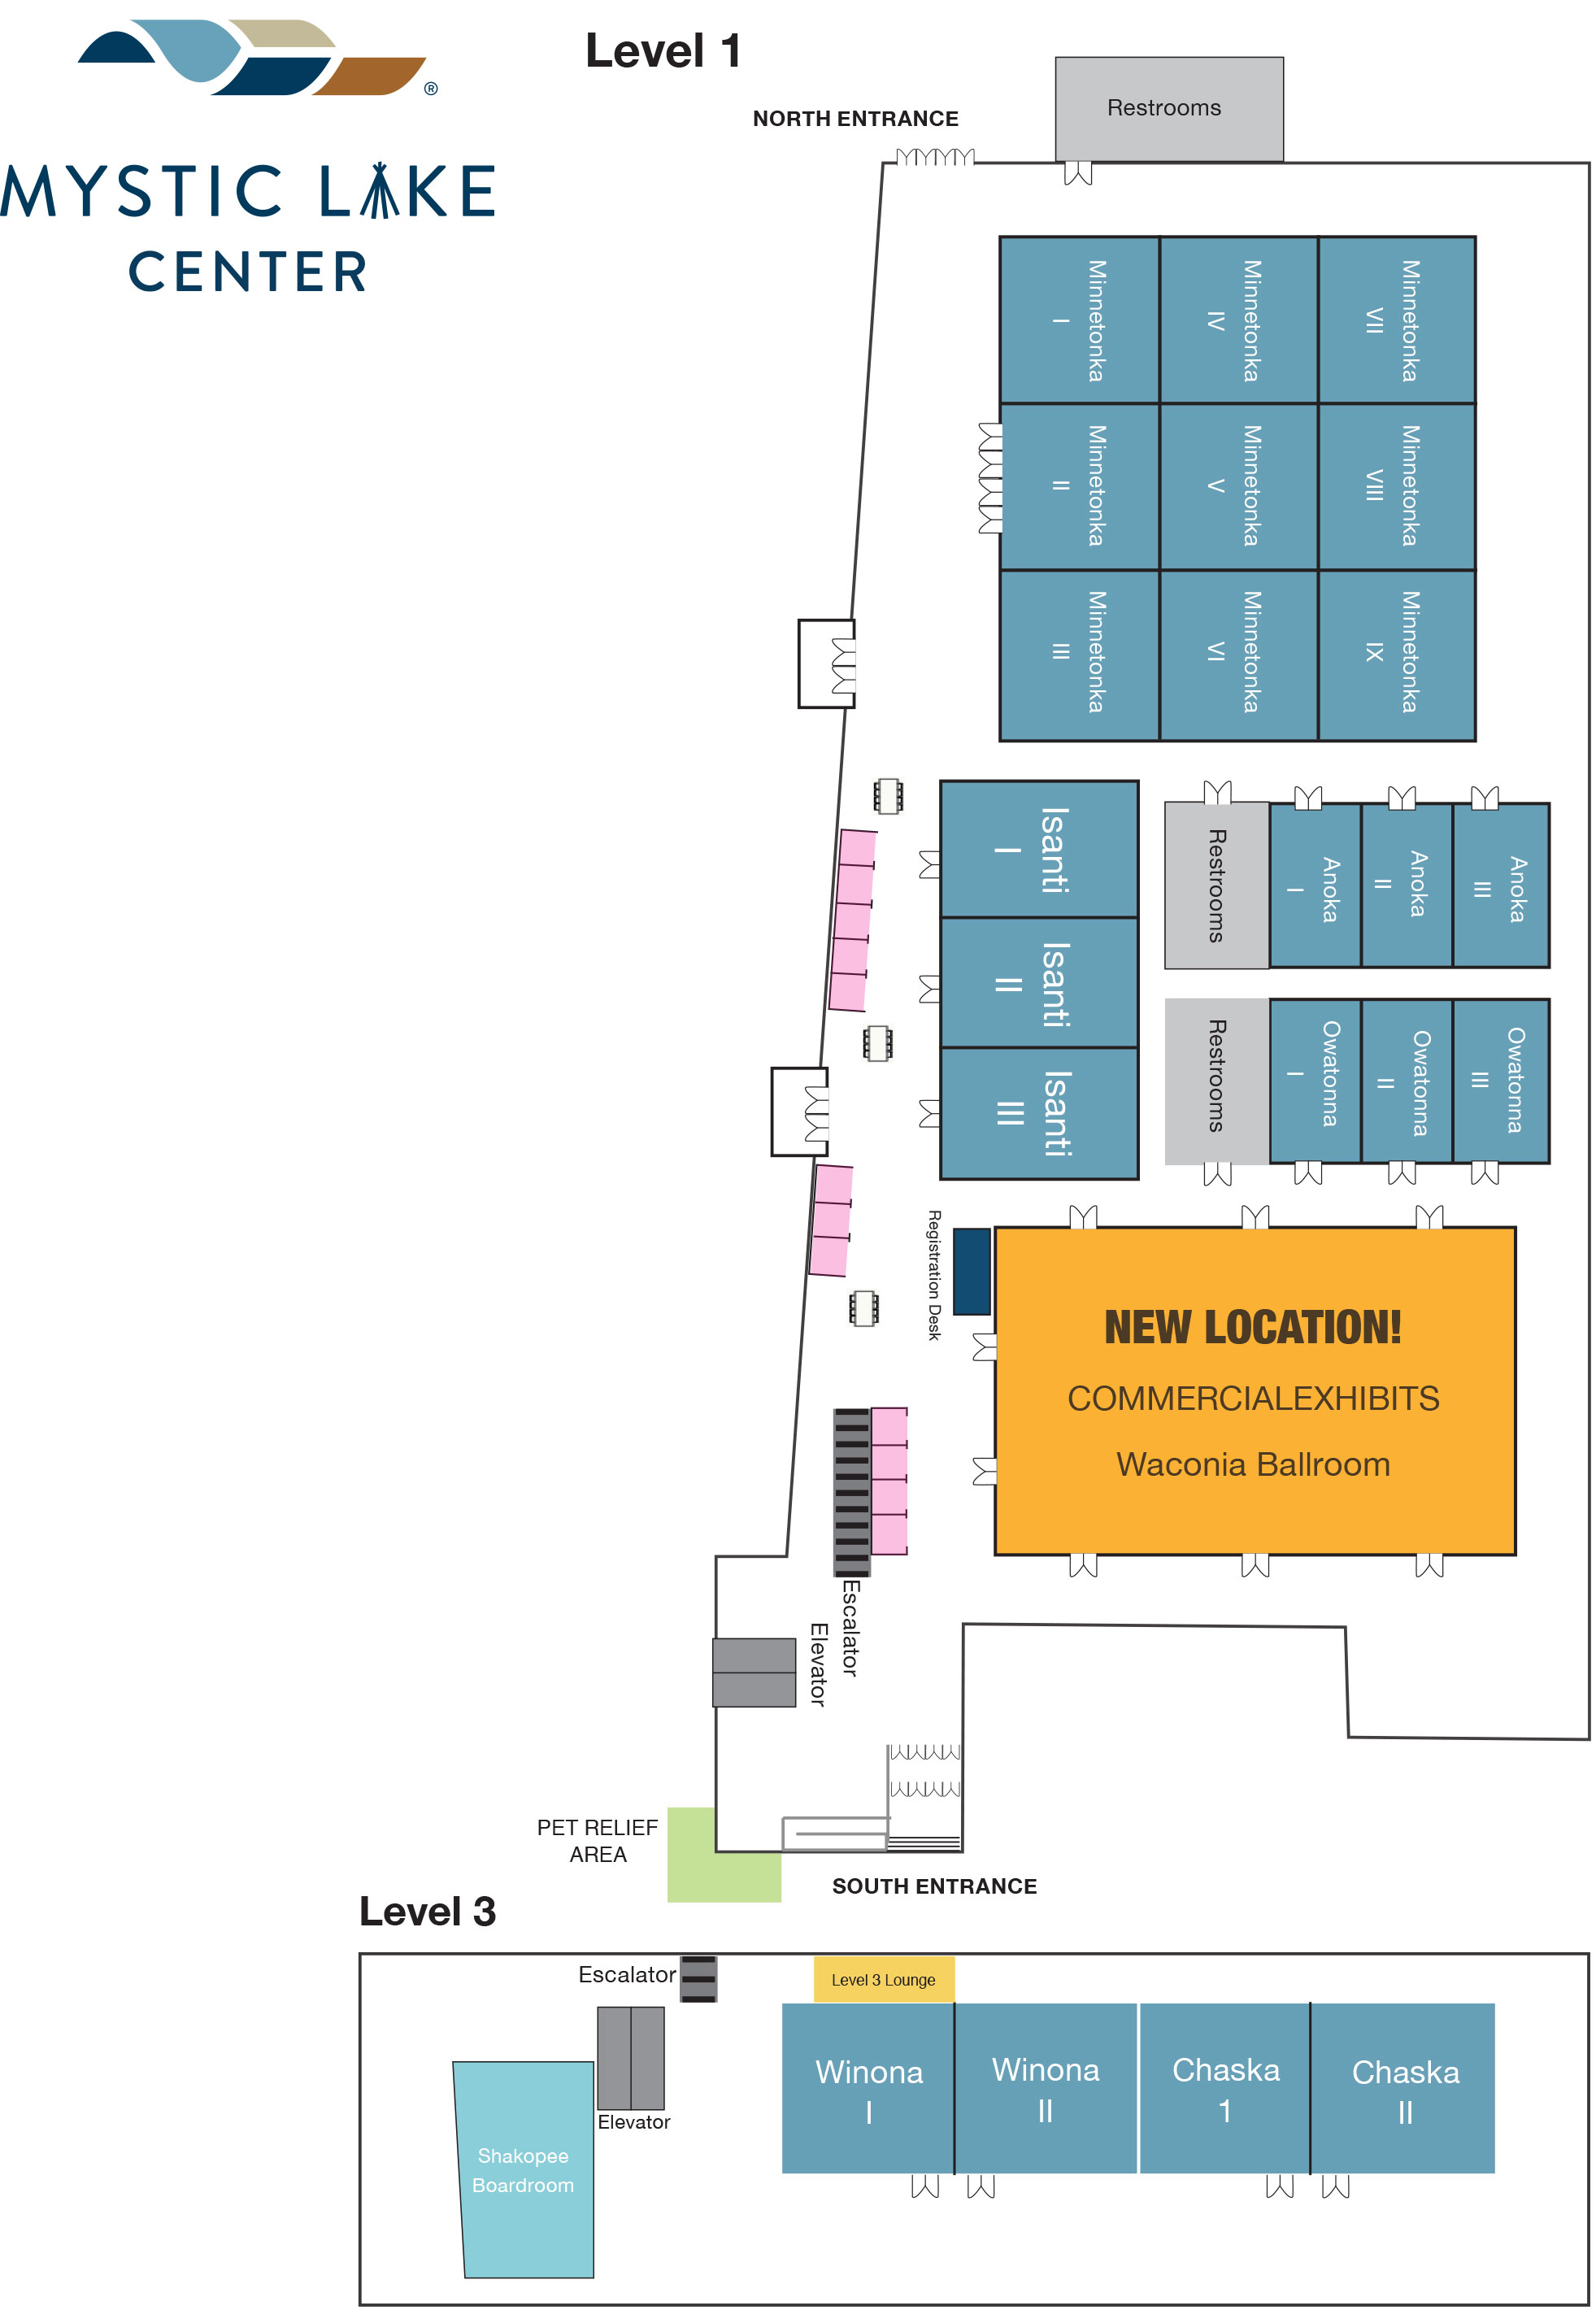 Map of Mystic Lake Center, identifying the new location of exhibits - Waconia Ballroom